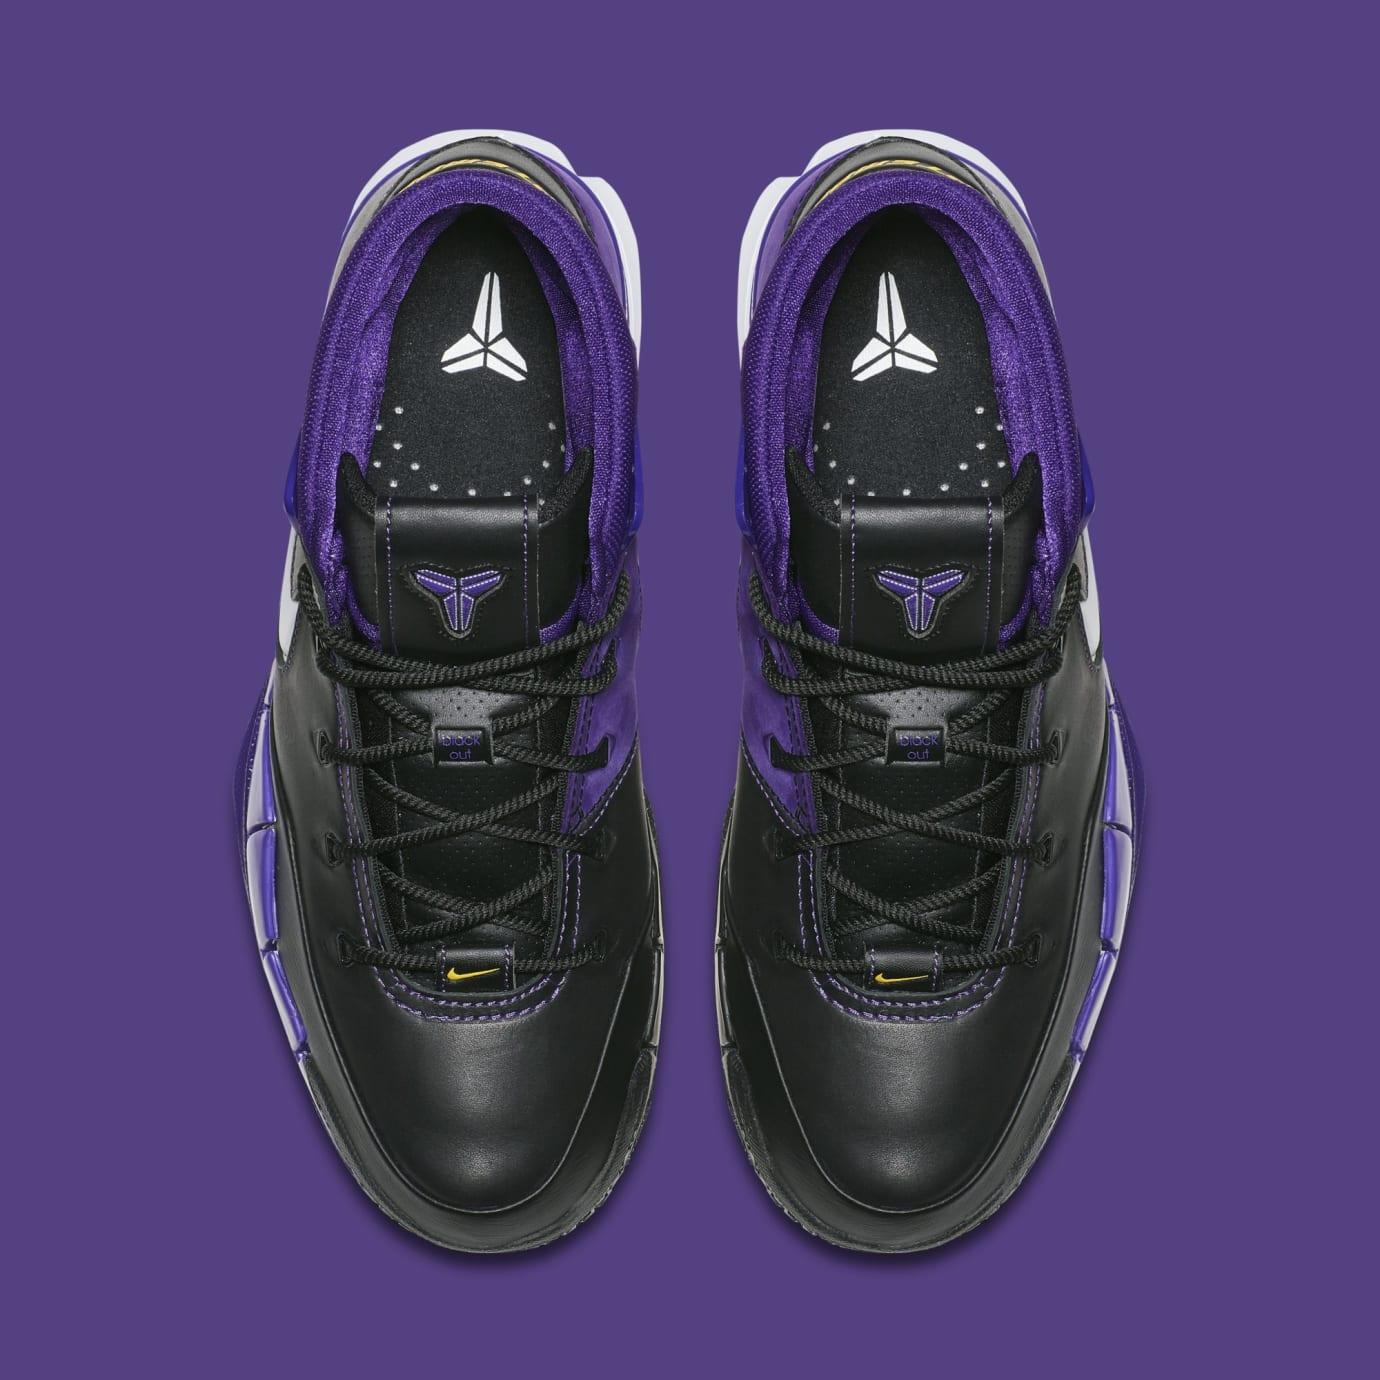 Nike Kobe 1 Protro AQ2728-004 (Top)